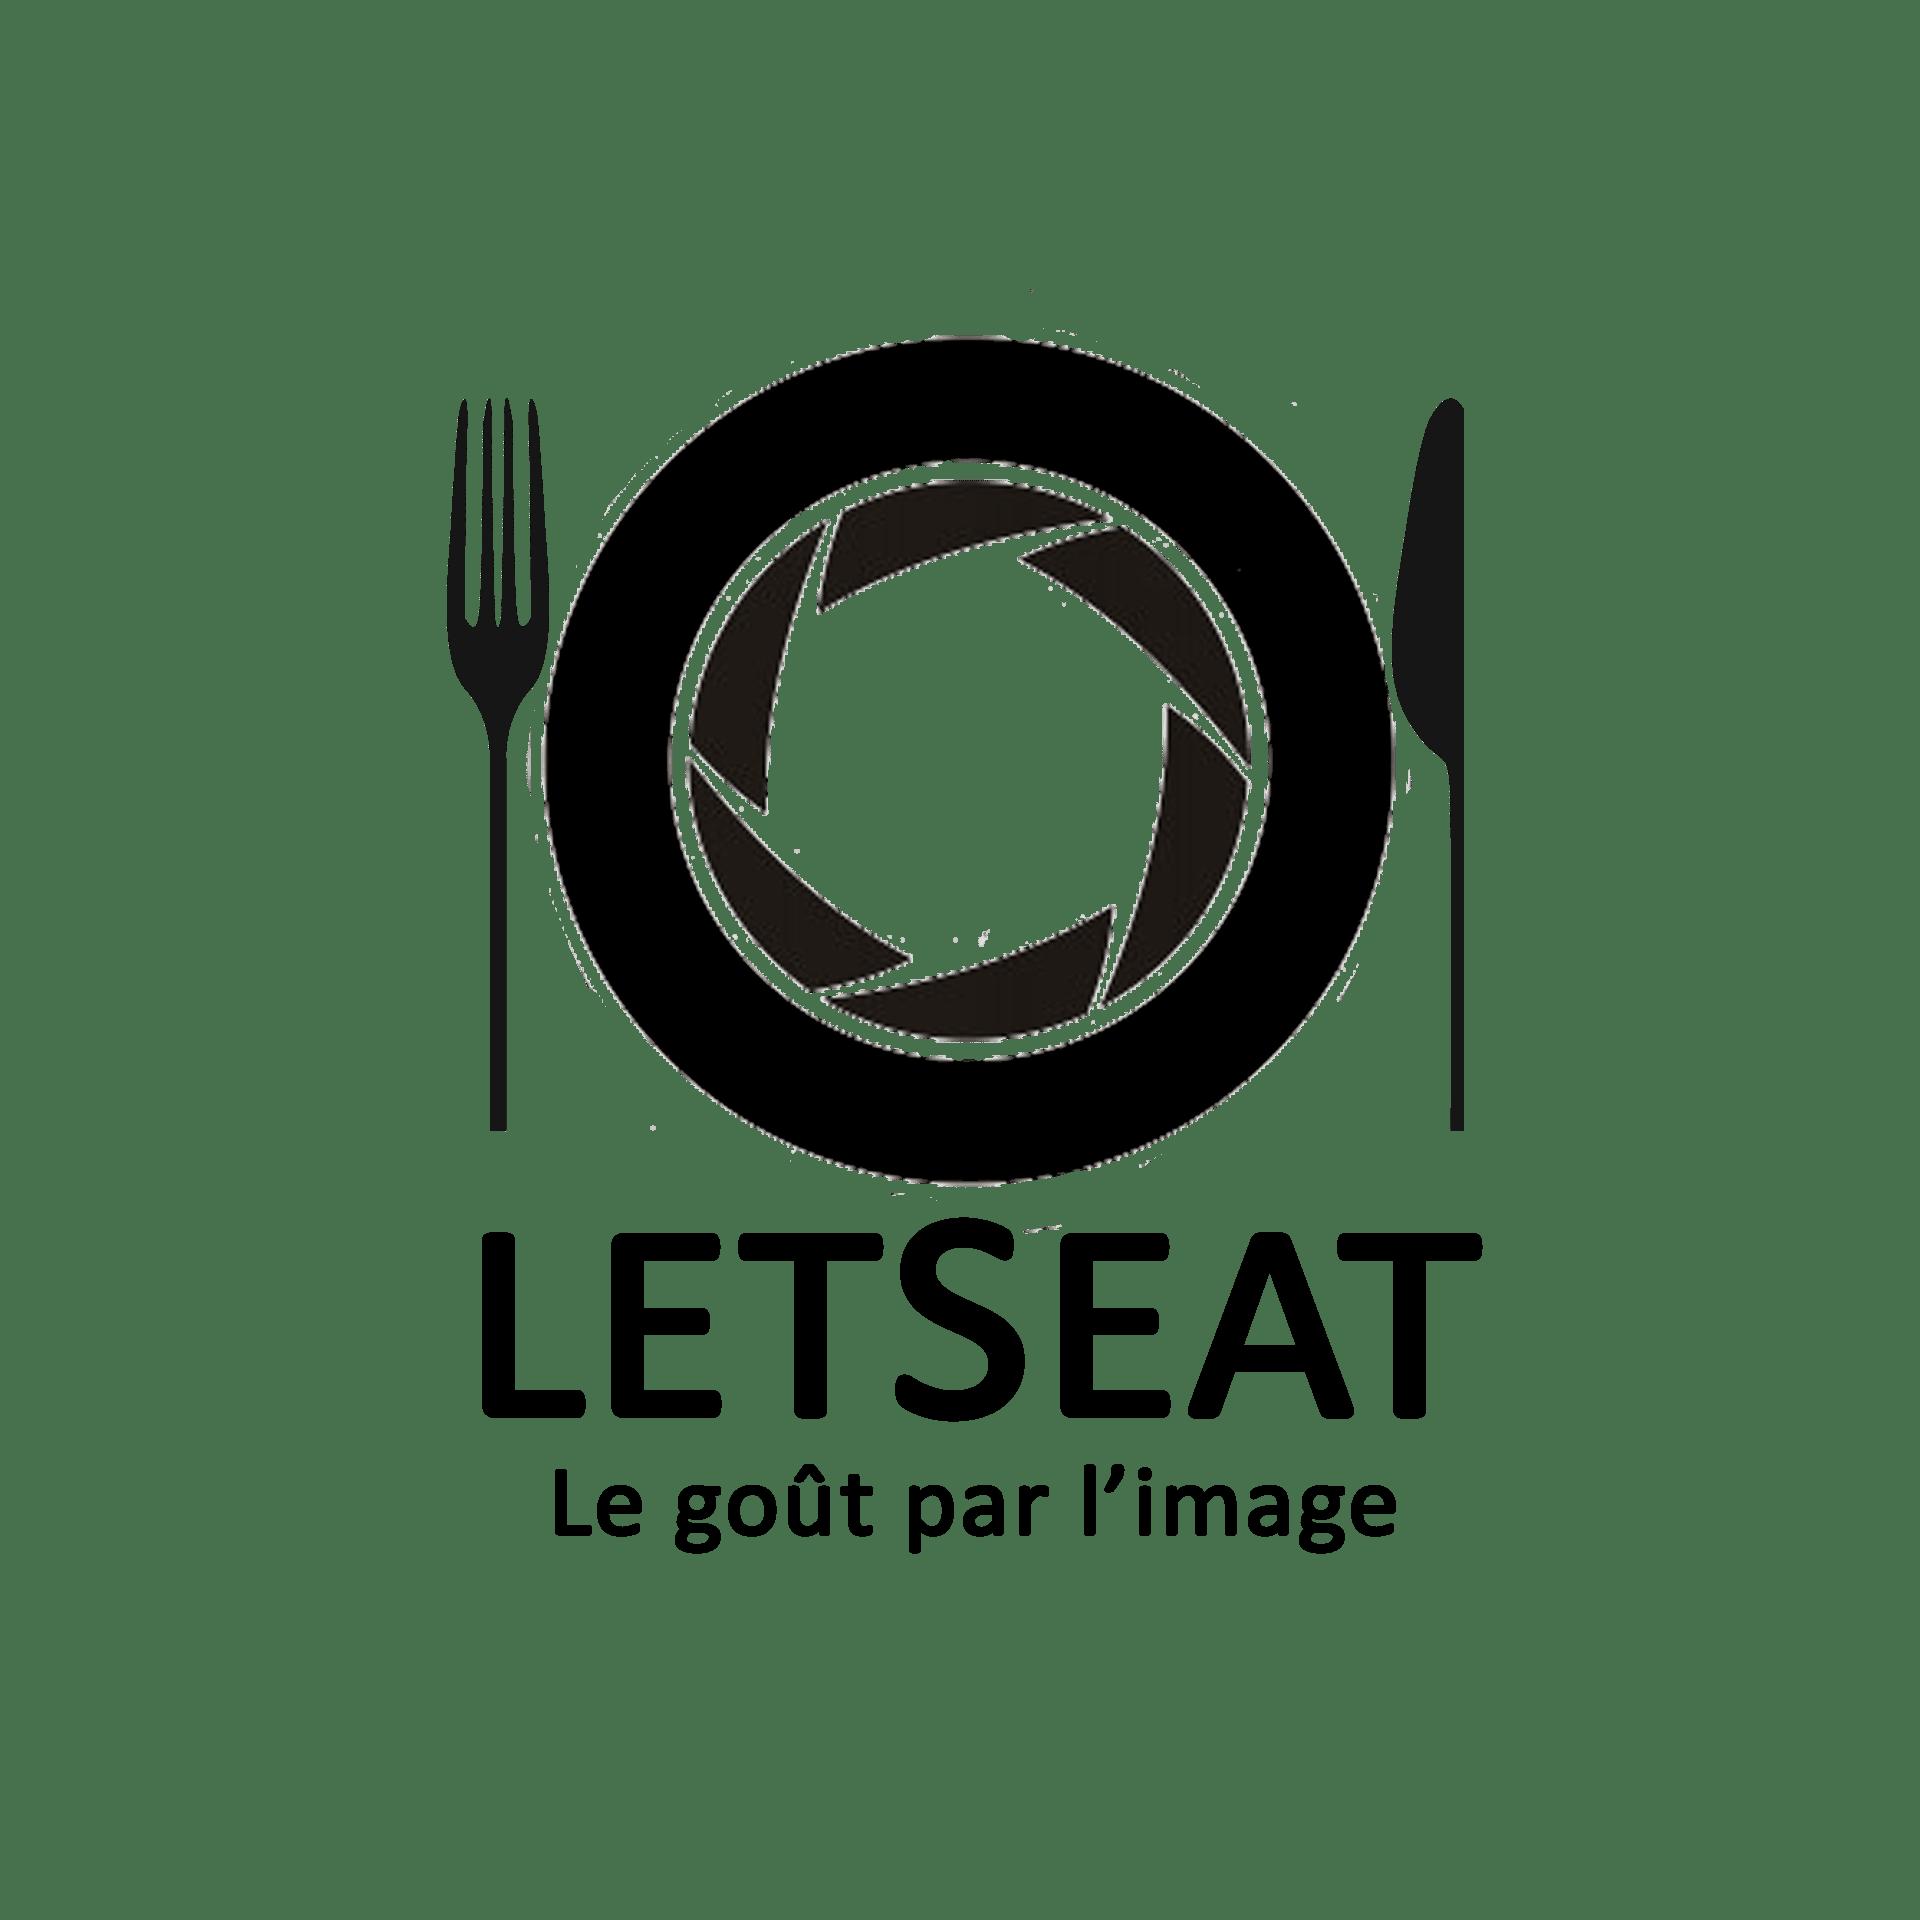 LETSEAT